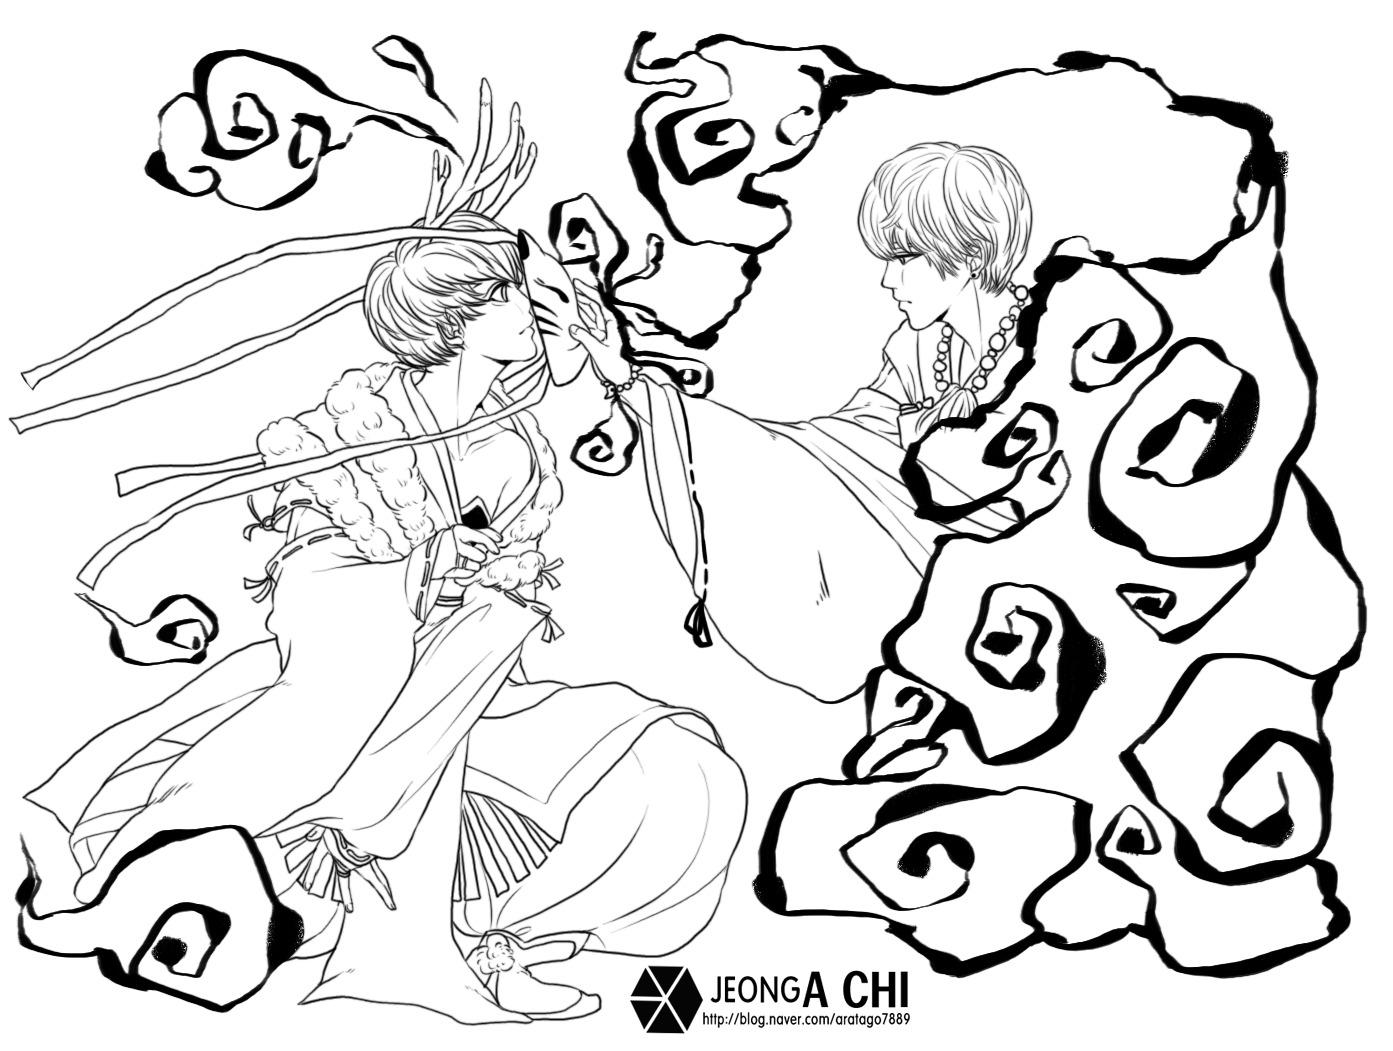 exo超能力标志简笔画